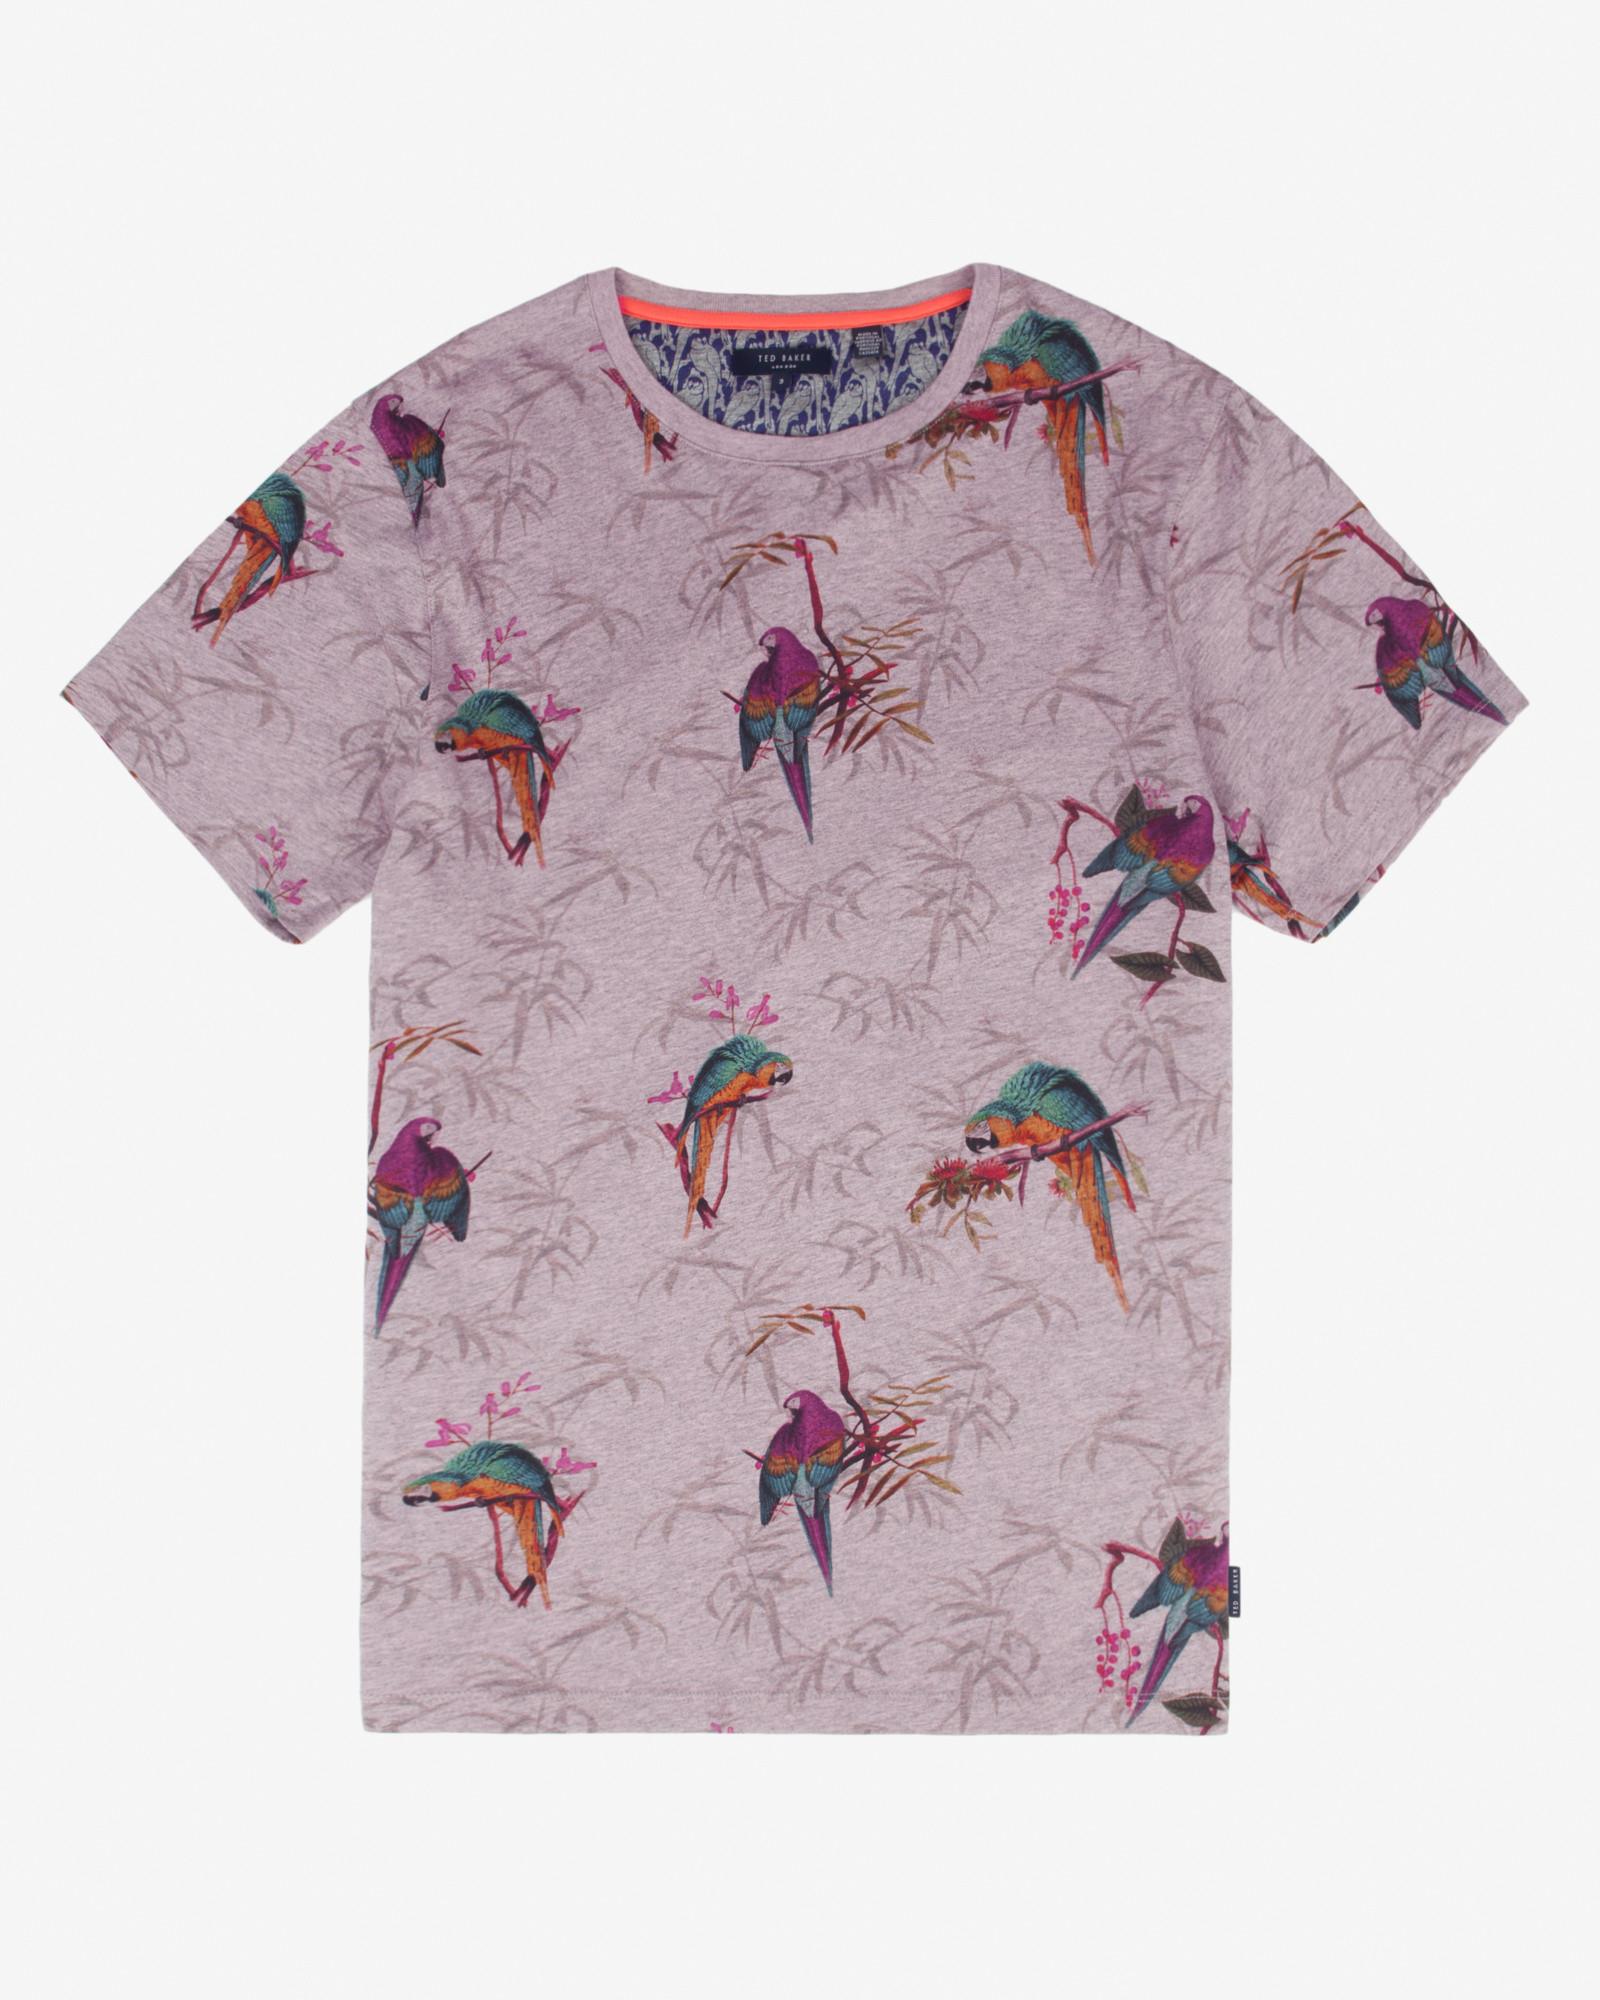 ed4e137d434b86 Ted Baker Parrot Print T-shirt in Purple - Lyst